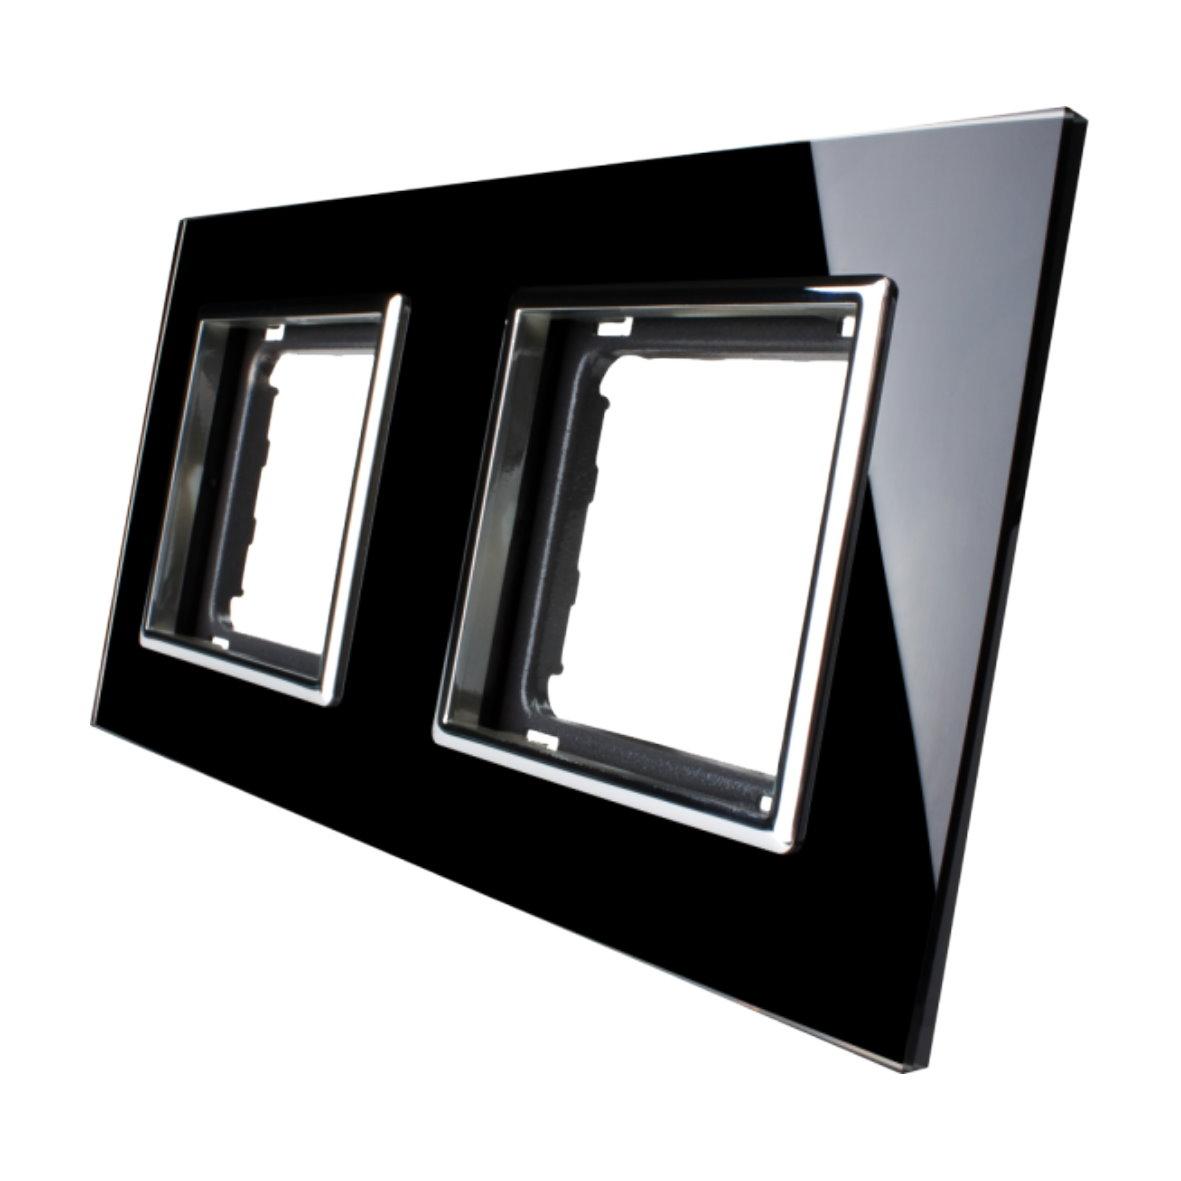 Glas Steckdosen. Orgon Ip Steckdose W Chrom Opal Metall Glas With ...